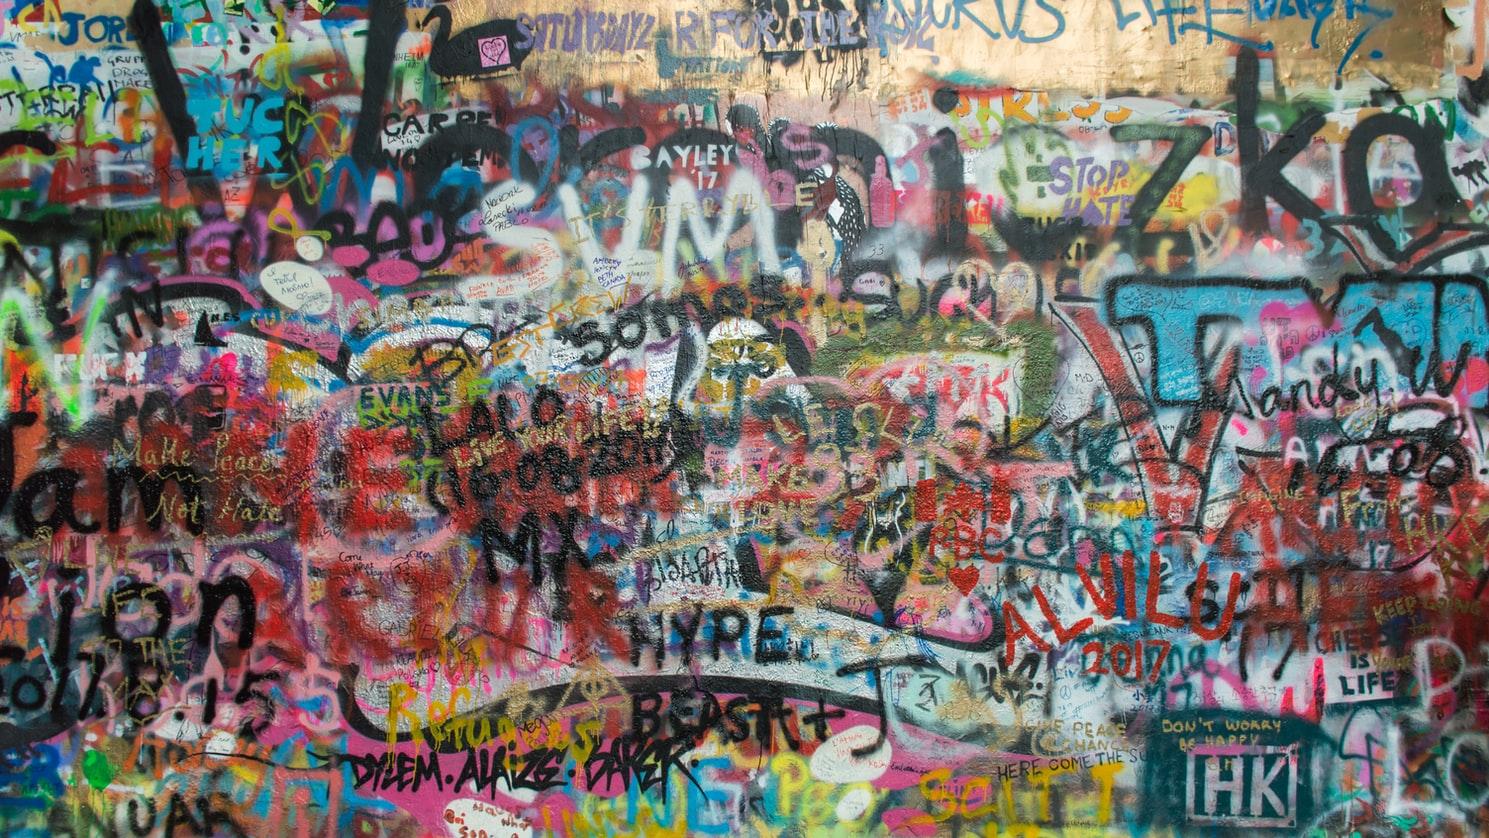 A graffiti covered wall